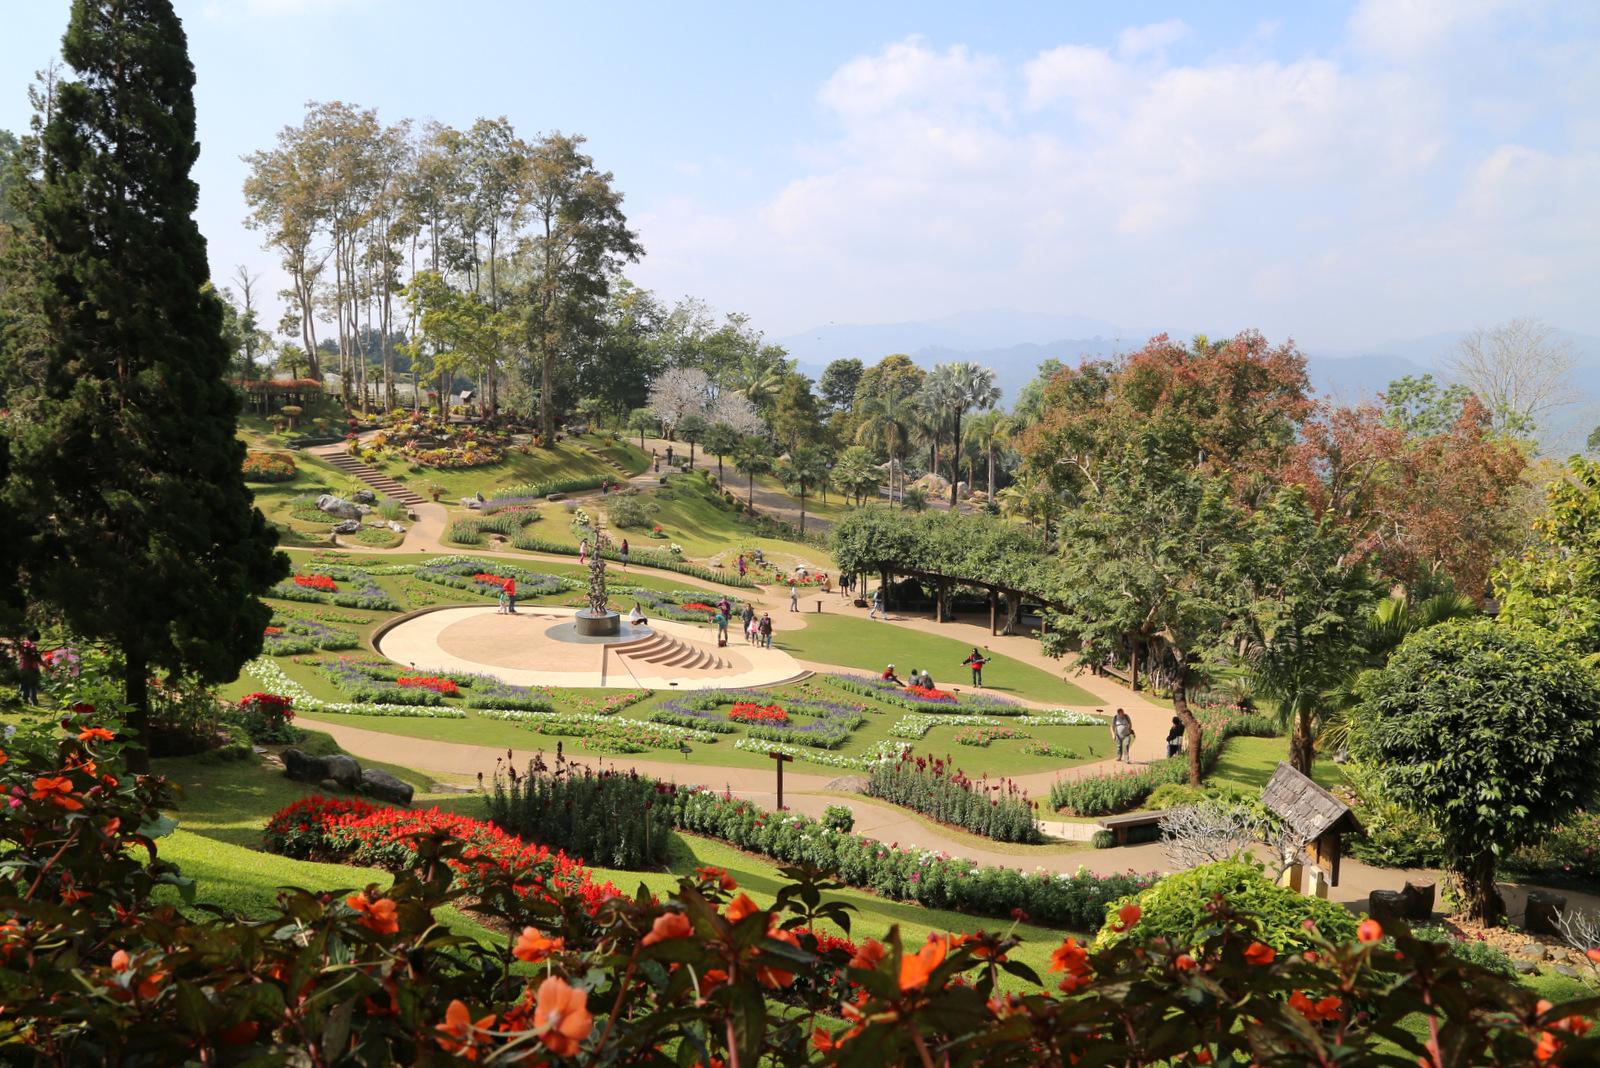 Doi Tung - Mae Fah Luang botanical garden